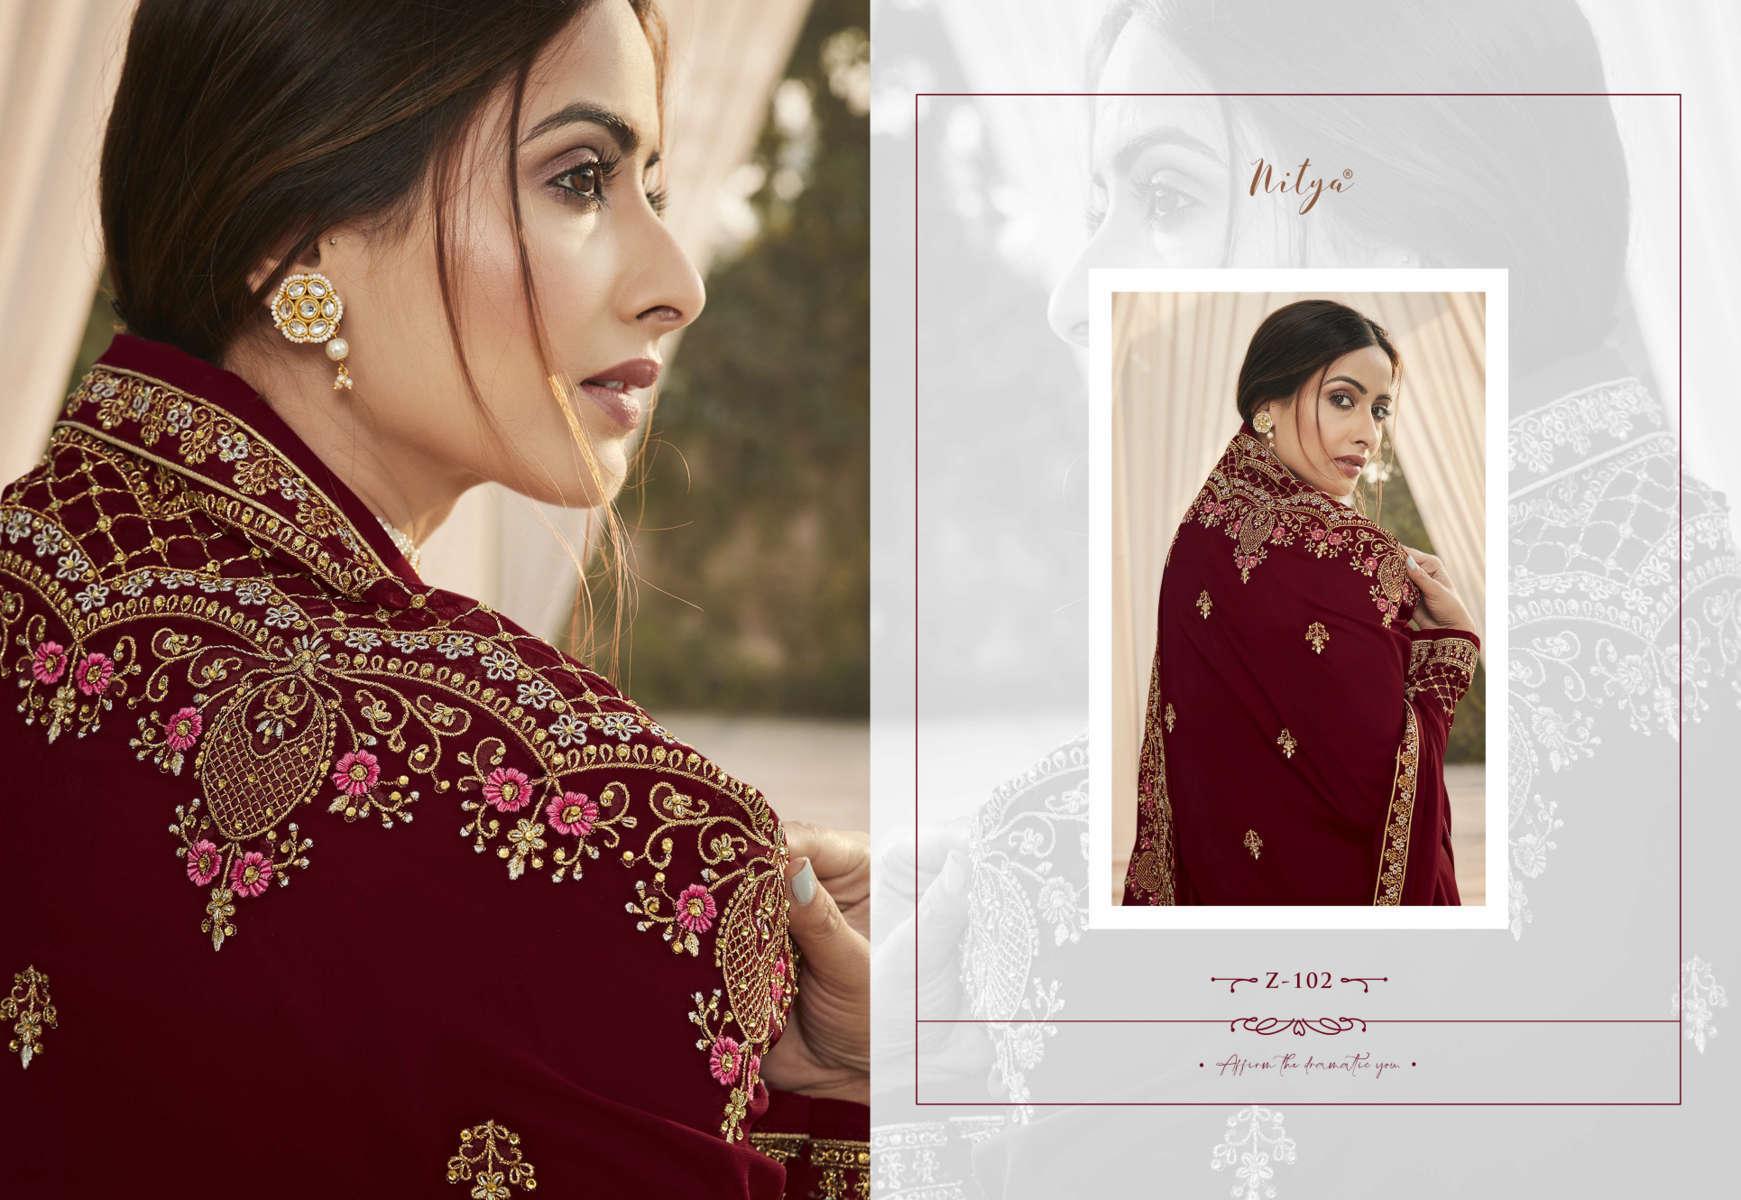 Lt Fabrics Nitya Zyrah Salwar Suit Wholesale Catalog 5 Pcs 3 1 - Lt Fabrics Nitya Zyrah Salwar Suit Wholesale Catalog 5 Pcs